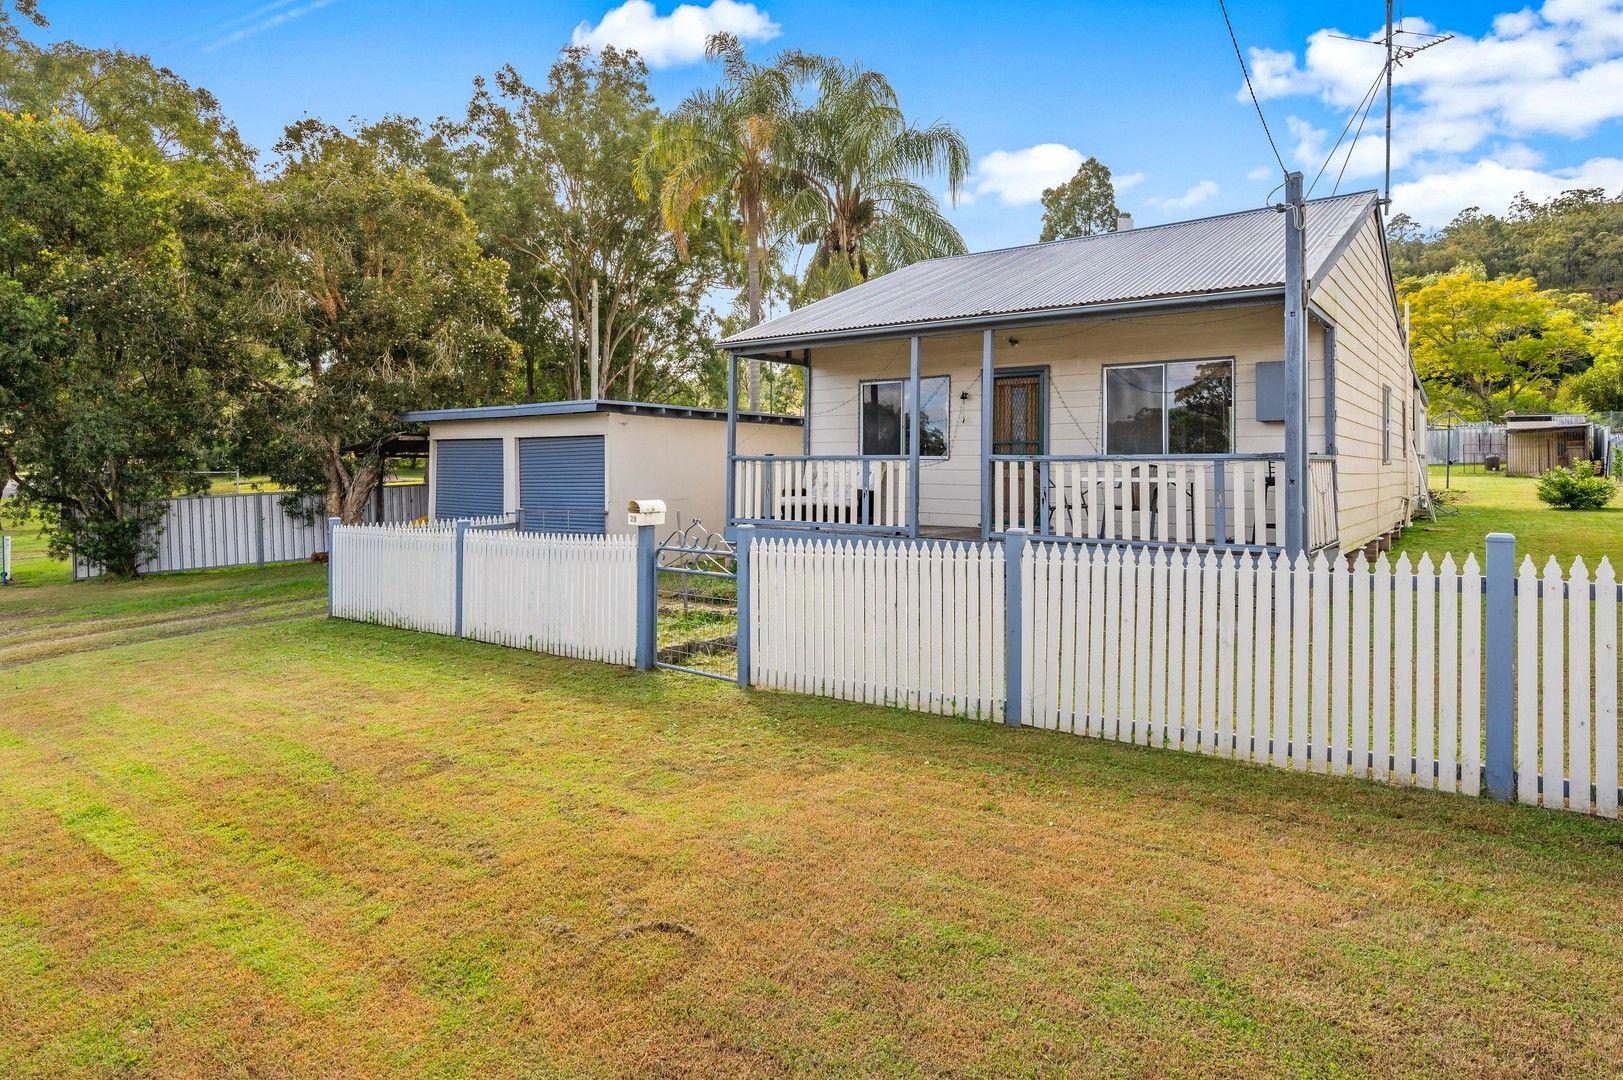 29 Cory Street, Martins Creek NSW 2420, Image 0